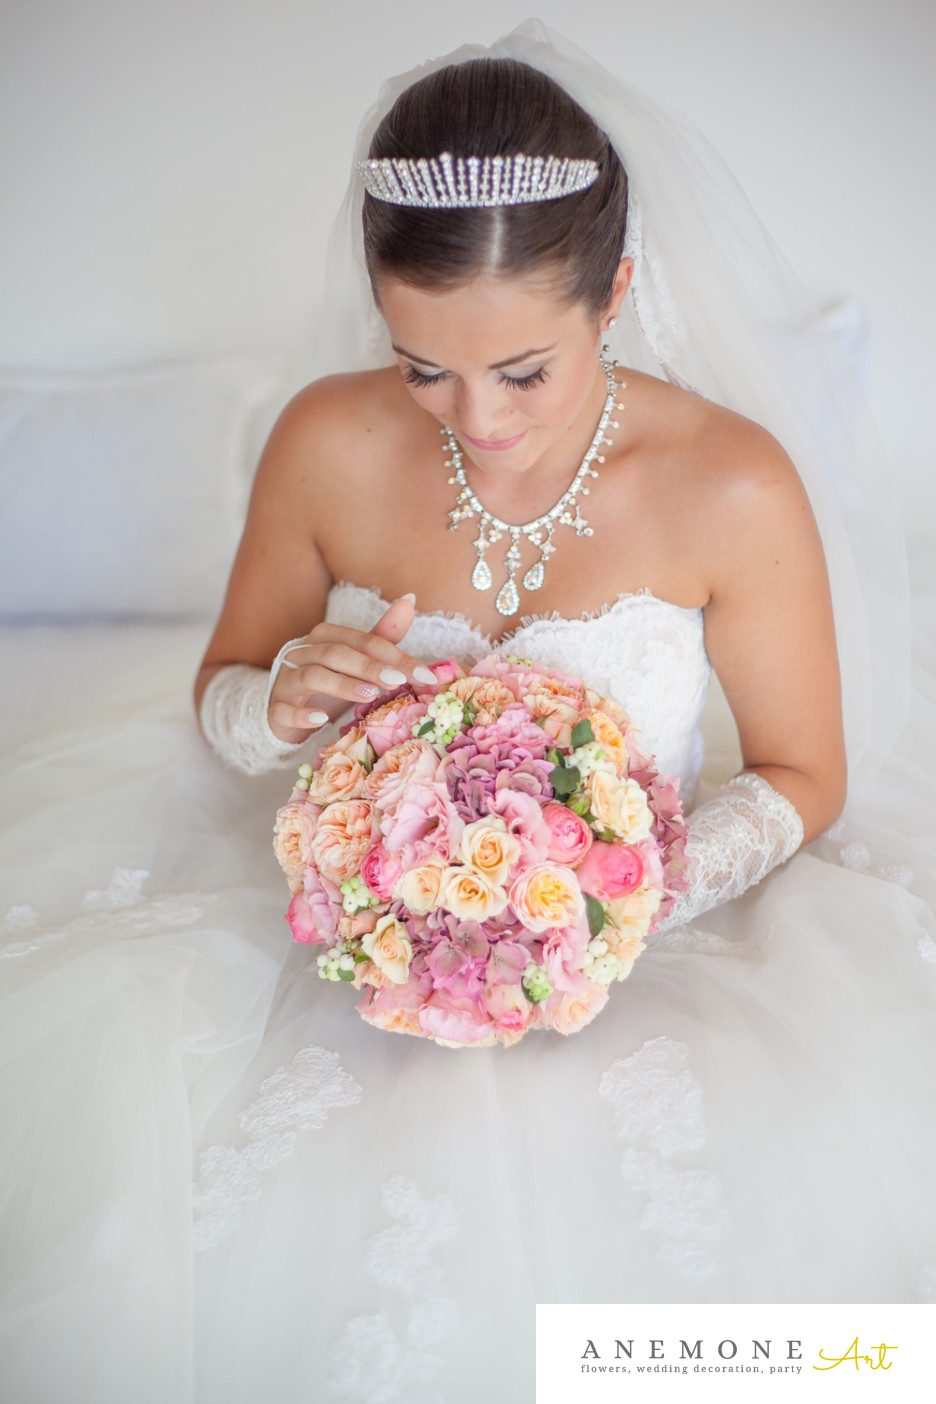 Poza, foto cu Flori de nunta buchet mireasa, piersica, roz, trandafiri in Arad, Timisoara, Oradea (wedding flowers, bouquets) nunta Arad, Timisoara, Oradea